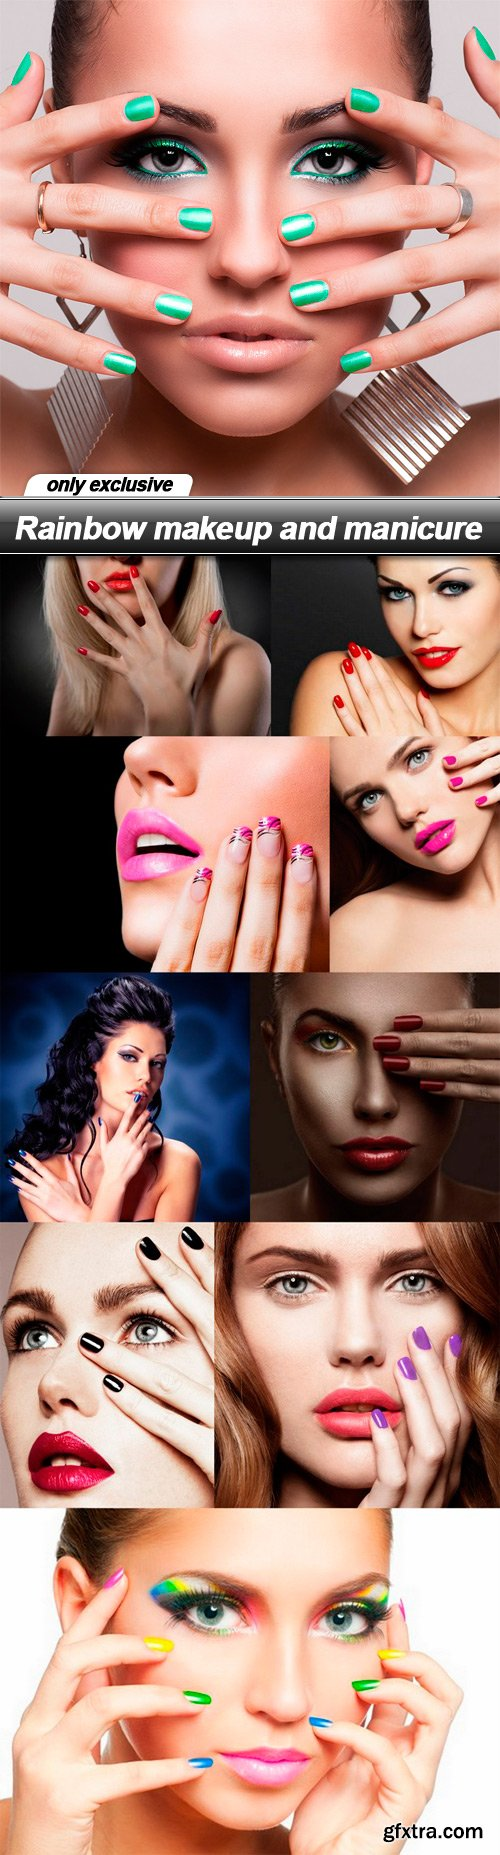 Rainbow makeup and manicure - 10 UHQ JPEG